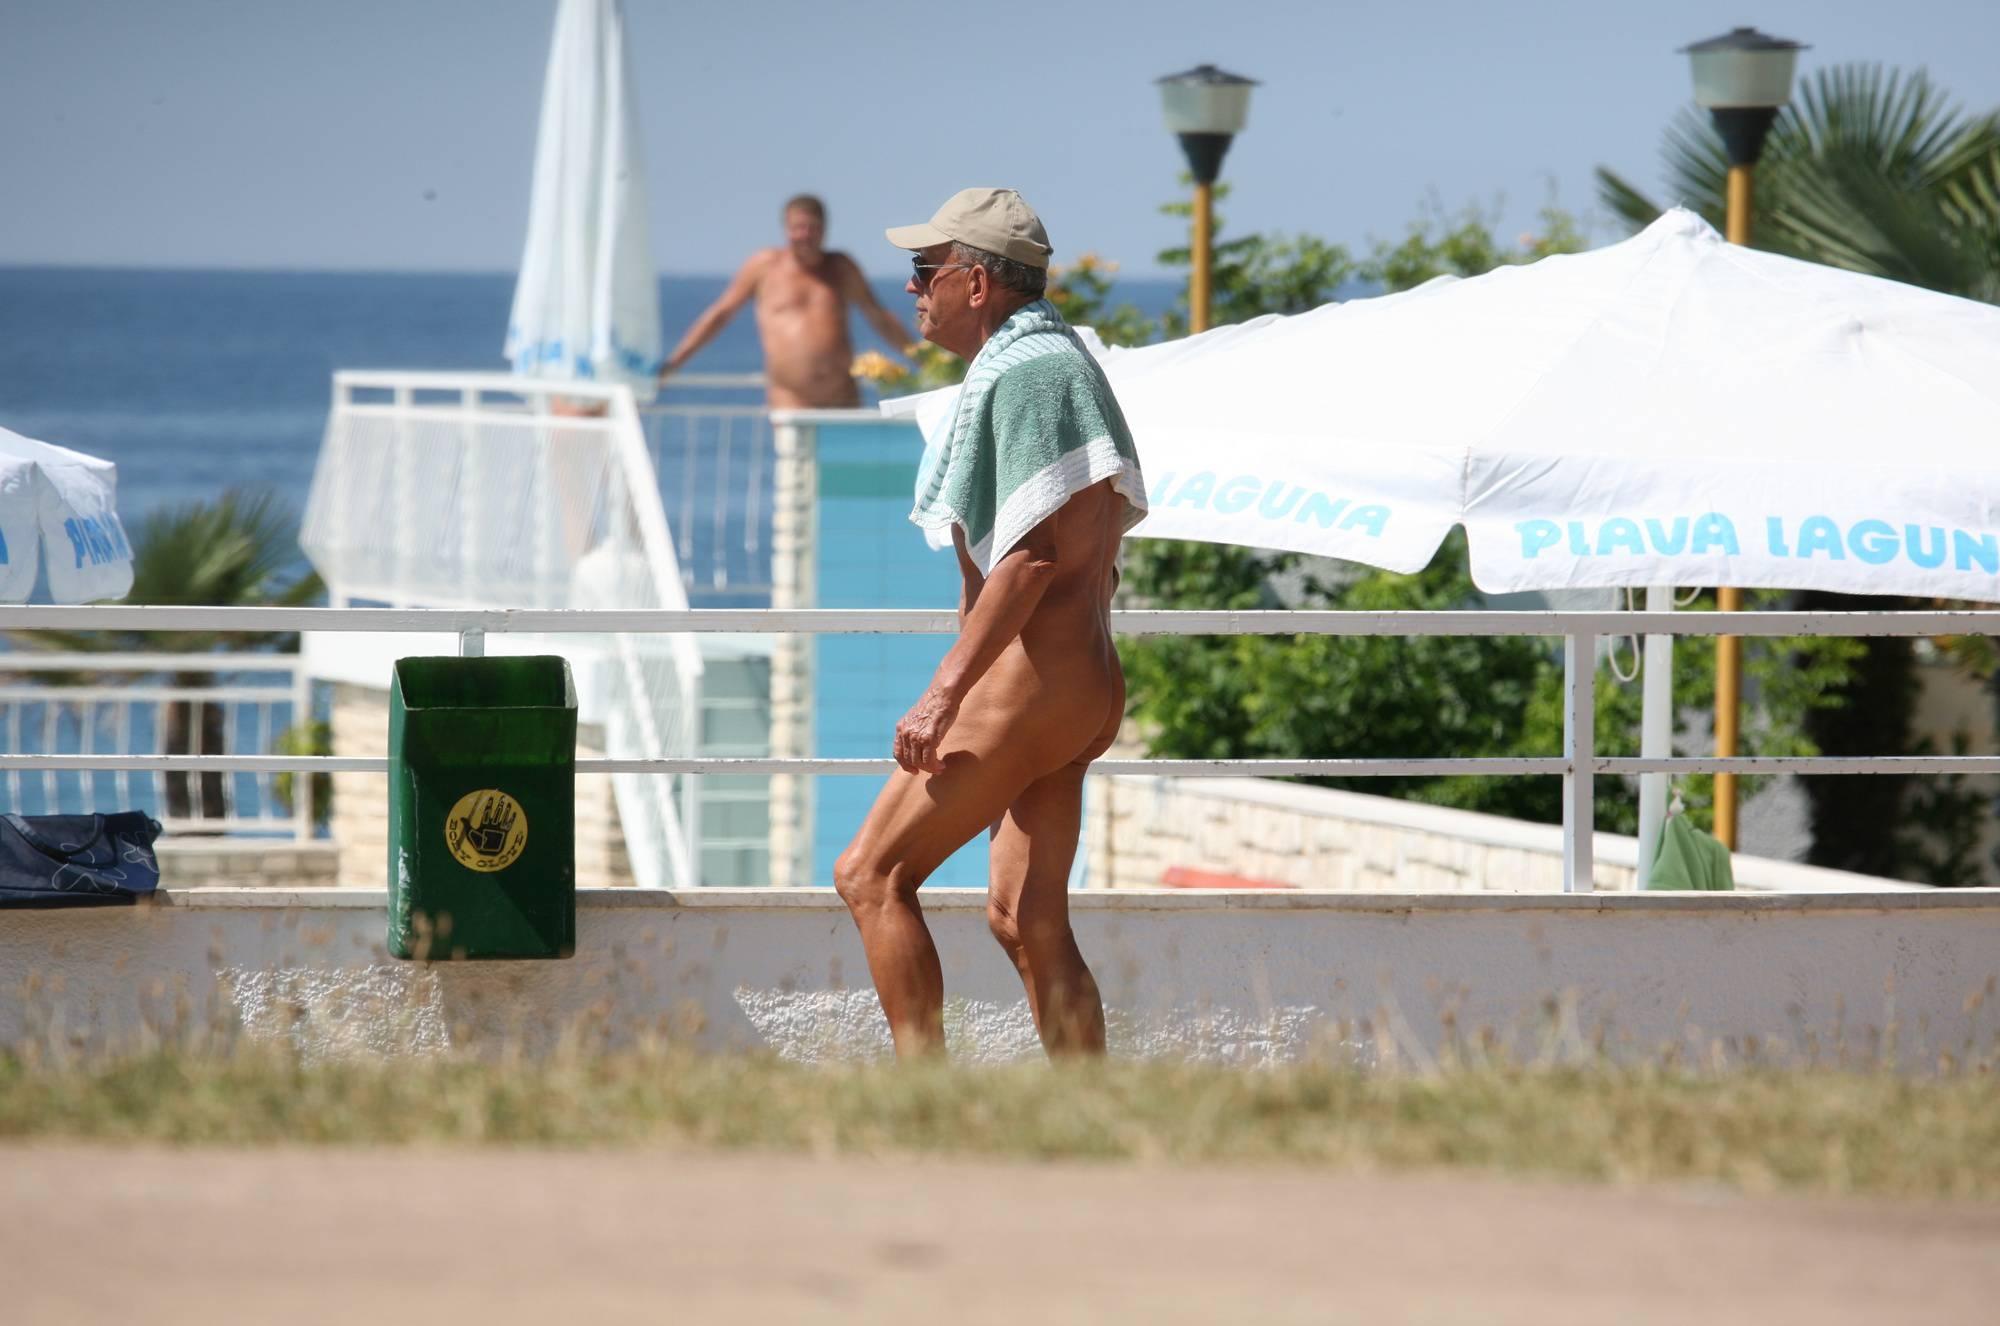 Pure Nudism Photos-Nuda Pool Visitor Walk-By - 2